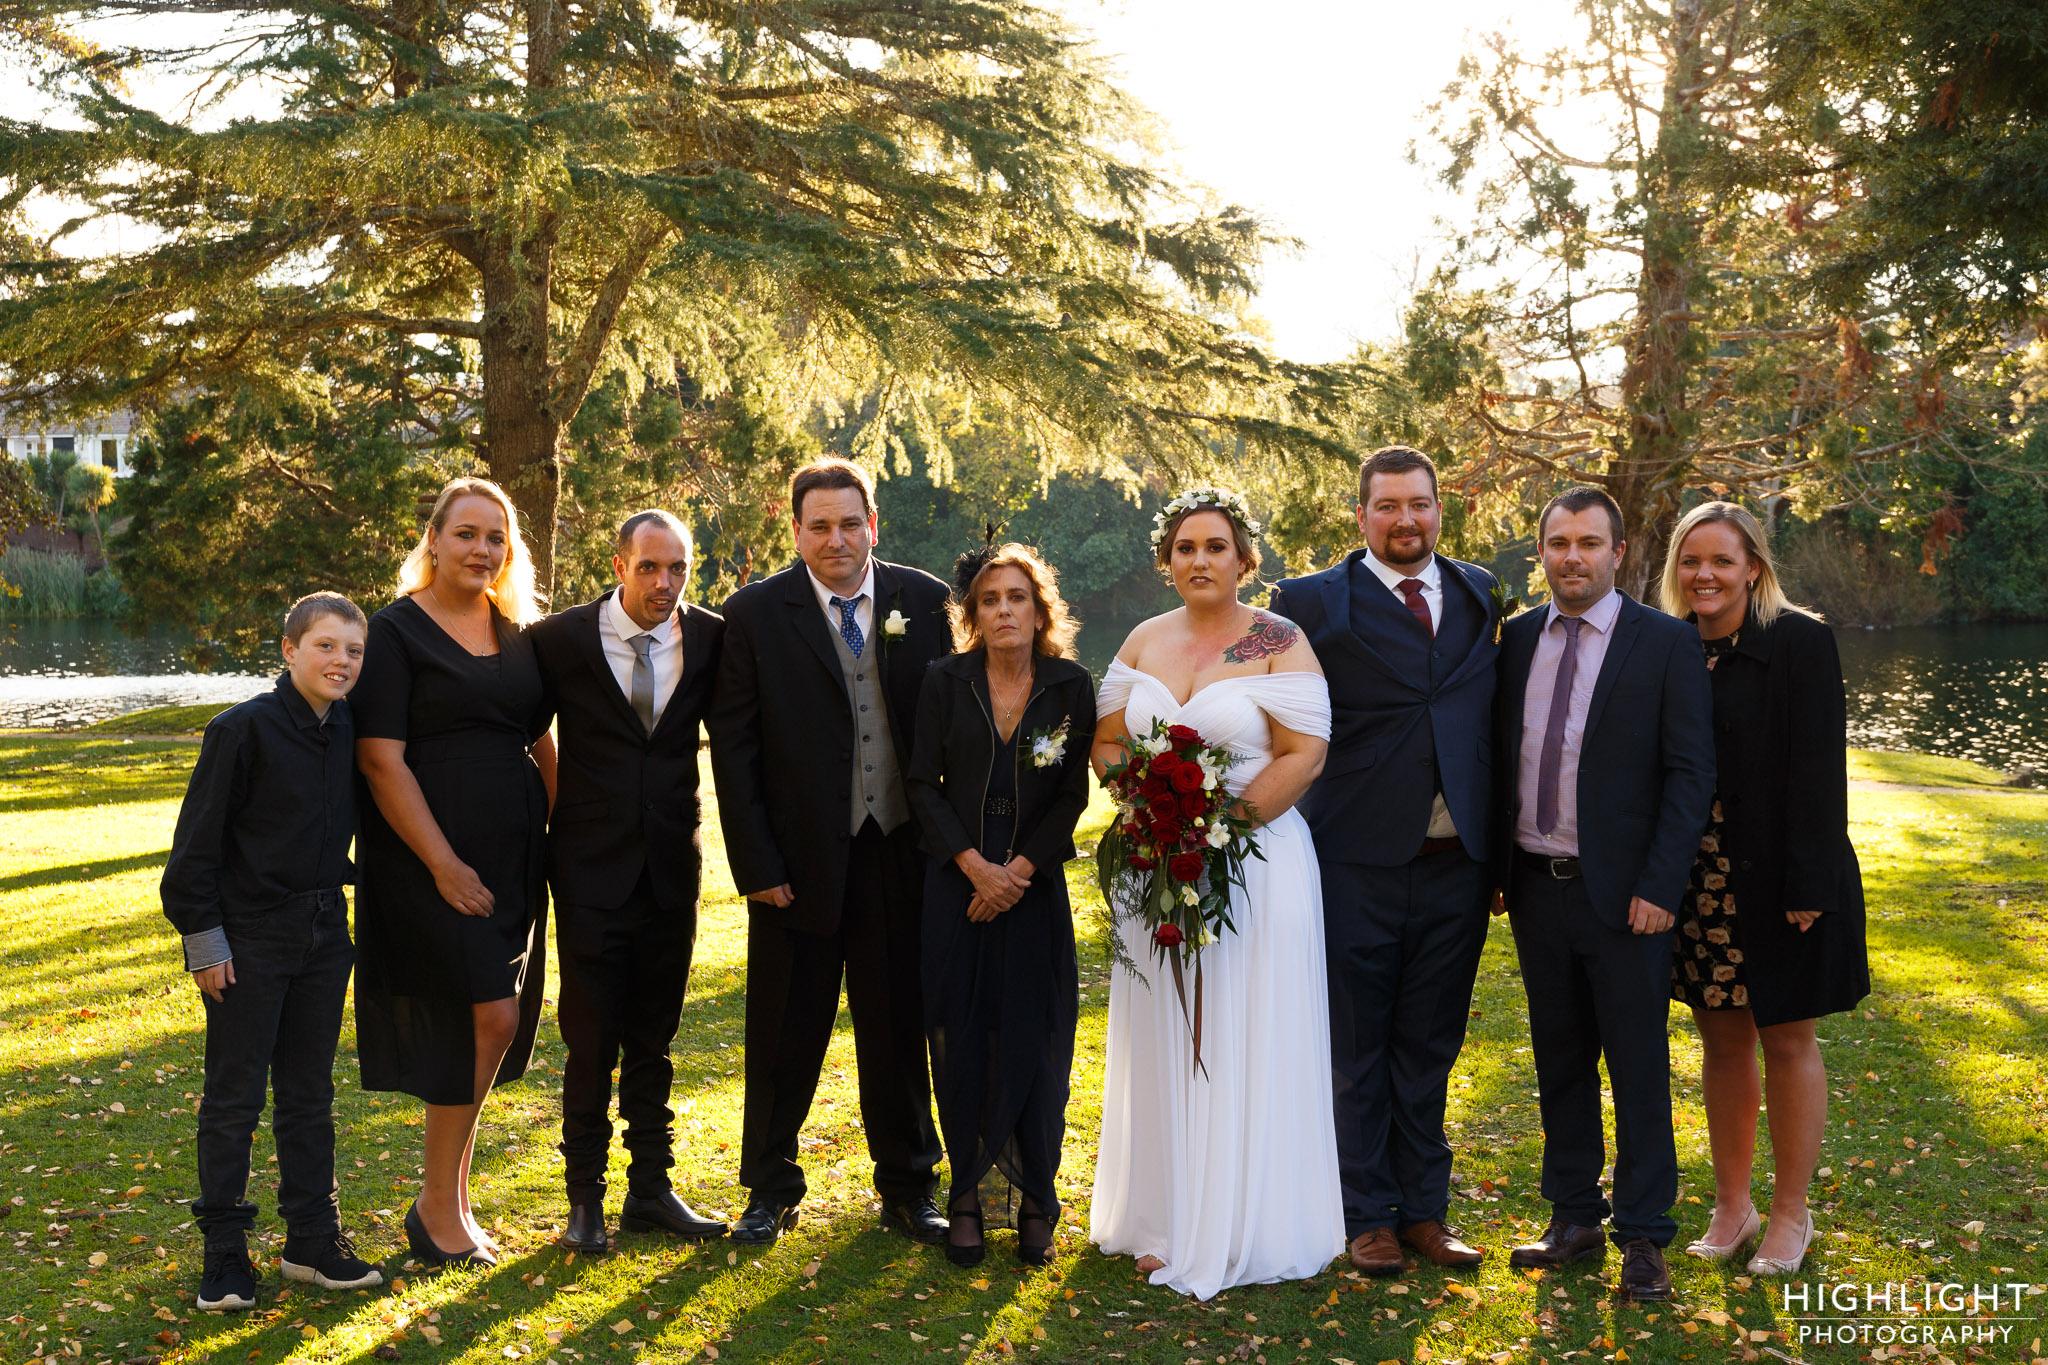 Highlight-wedding-photography-new-zealand-palmerston-north-68.jpg